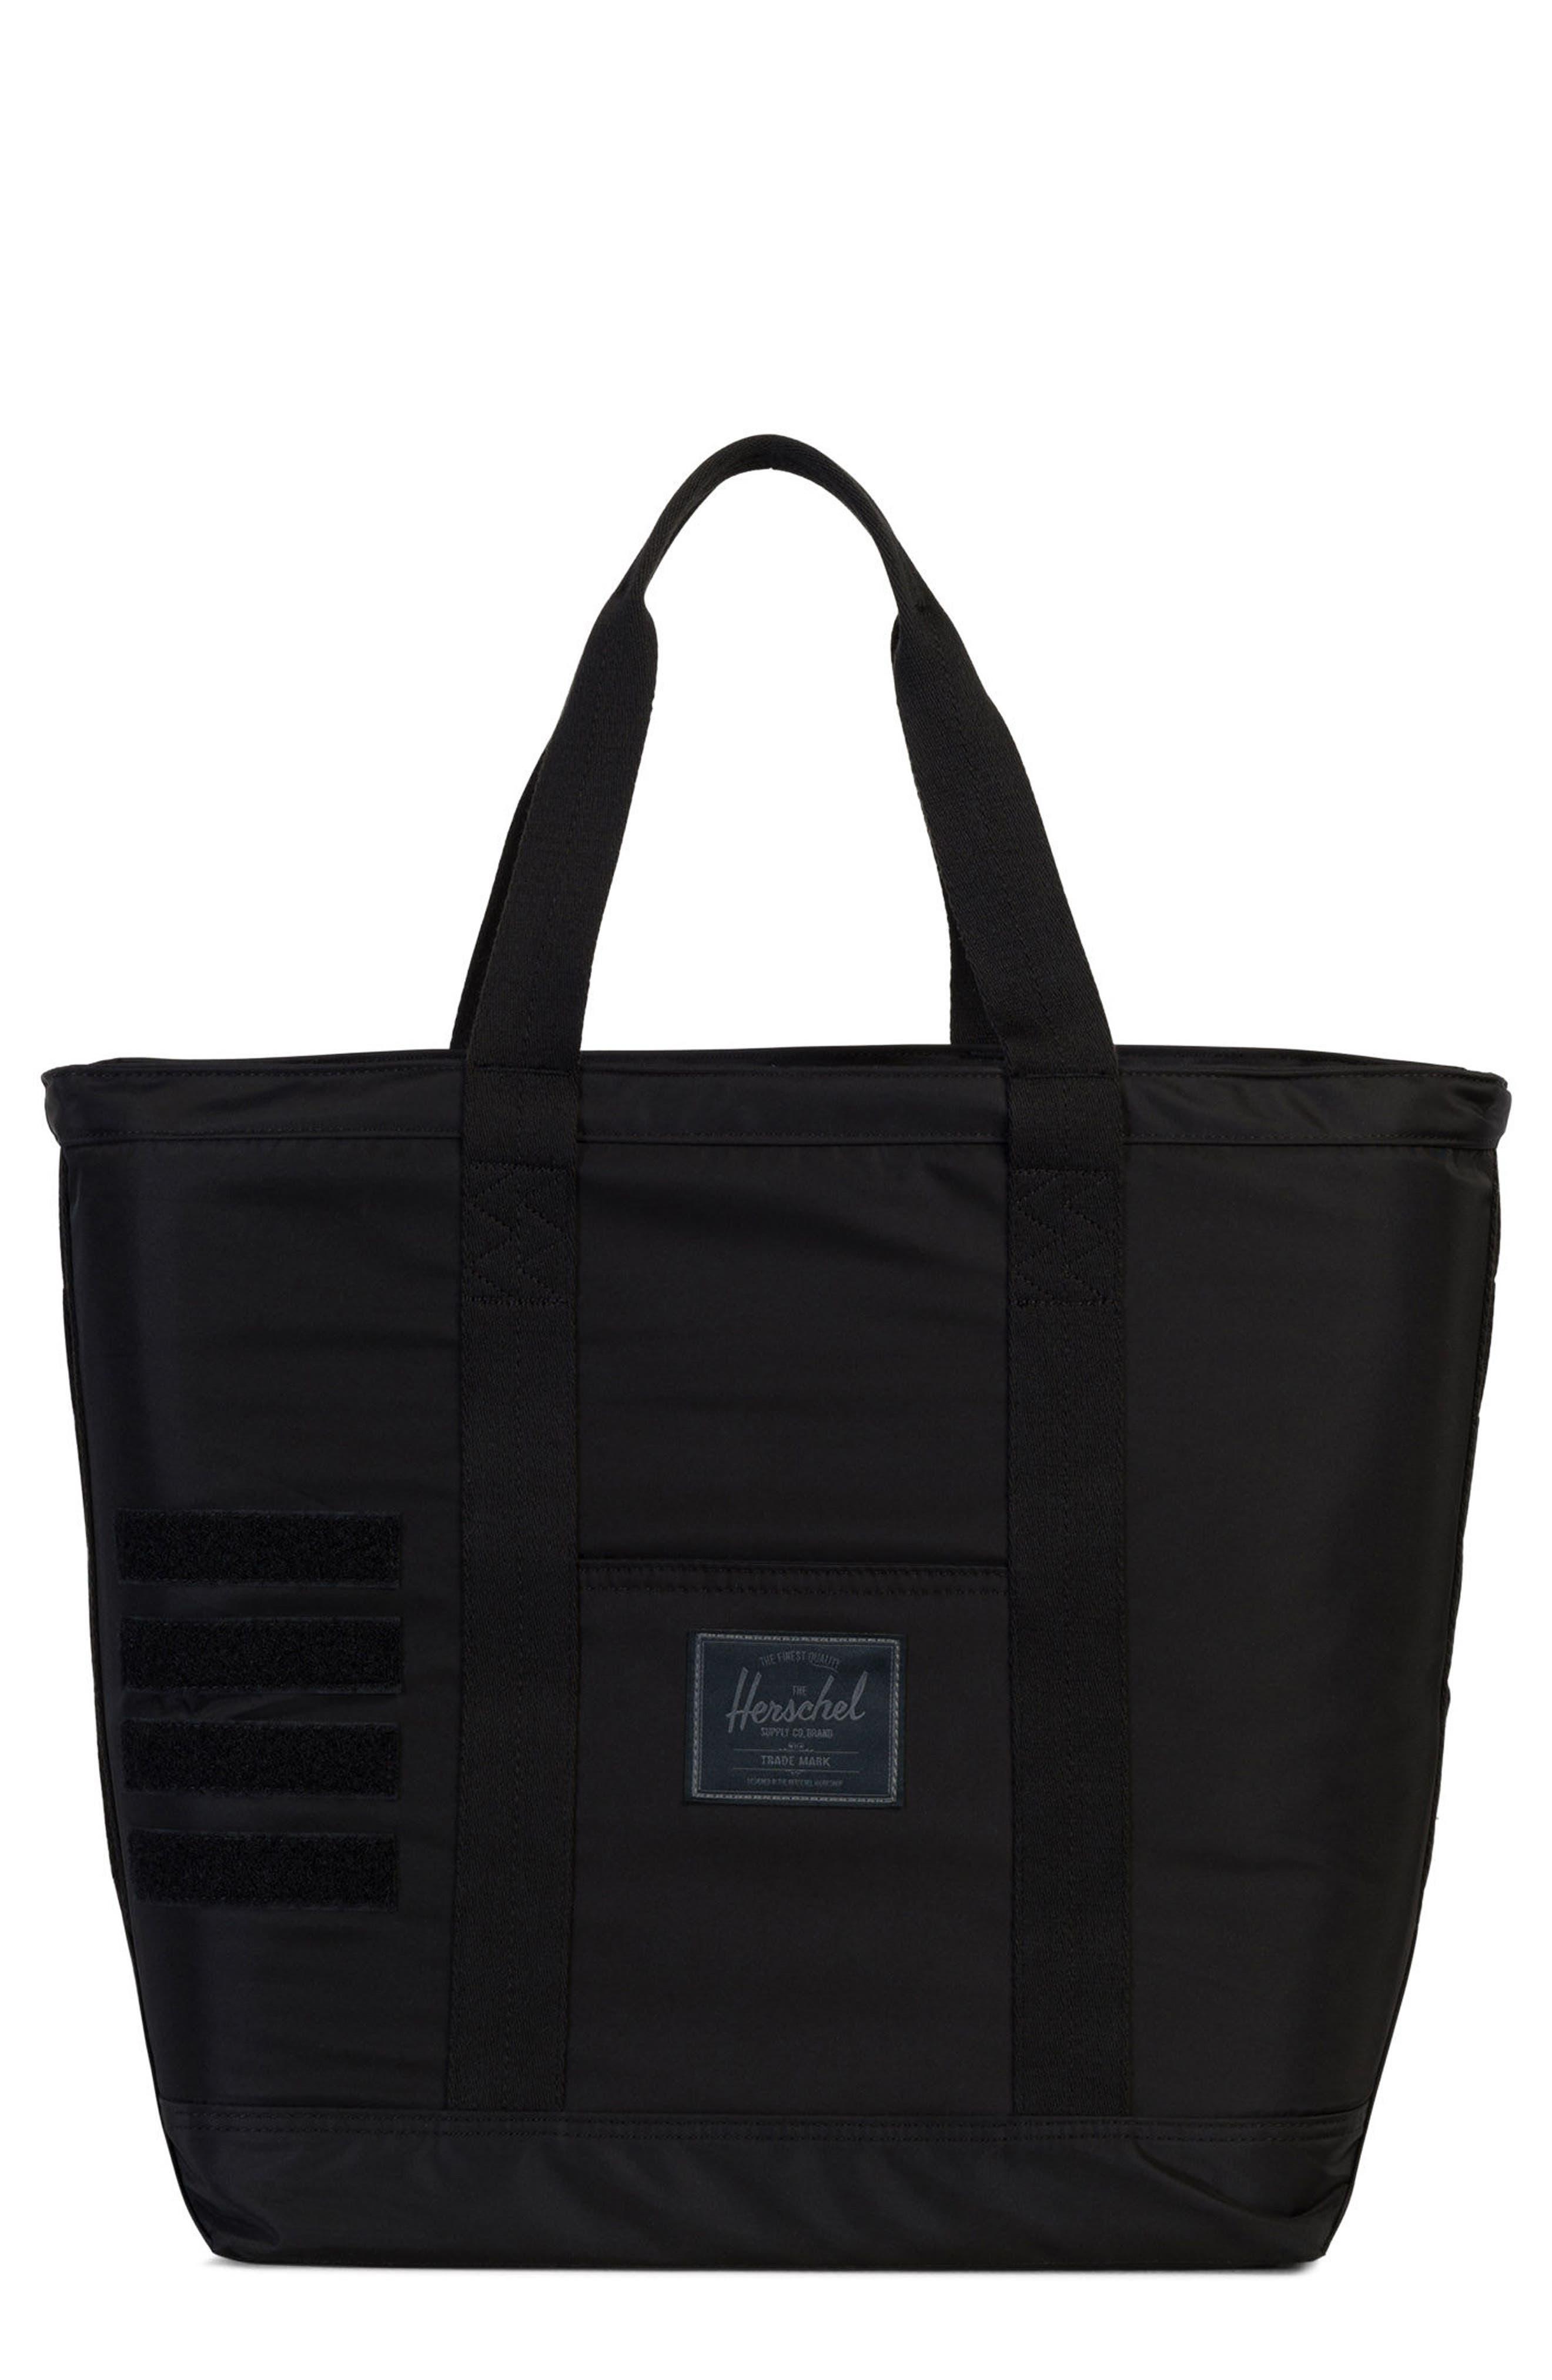 Bamfield Surplus Collection Tote Bag,                             Main thumbnail 1, color,                             Black